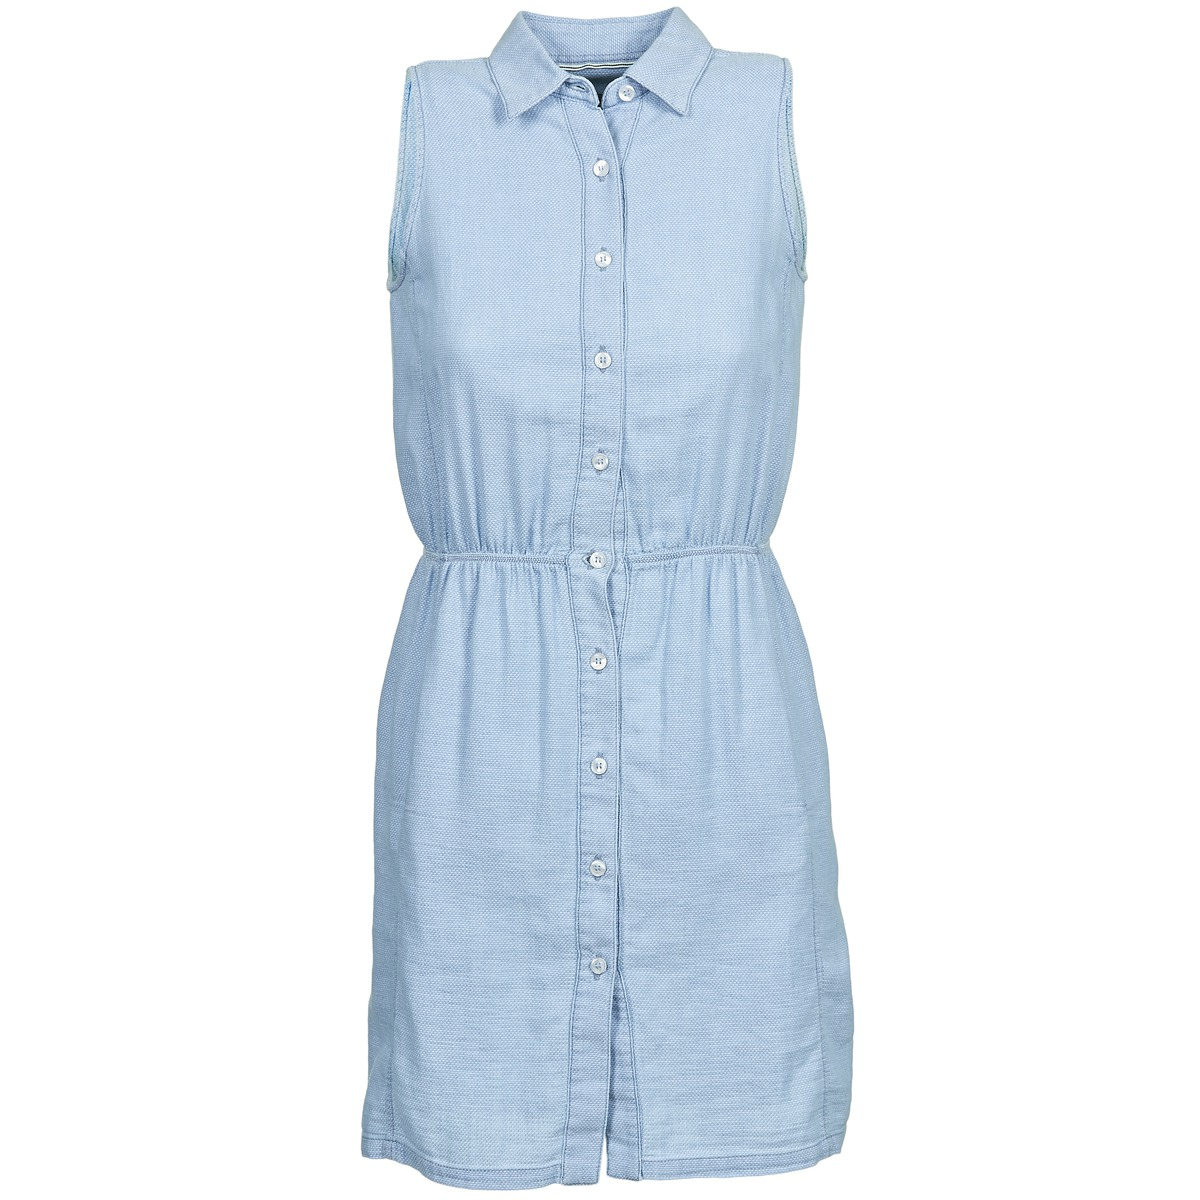 Gant korte jurk o. indigo jacquard blauw